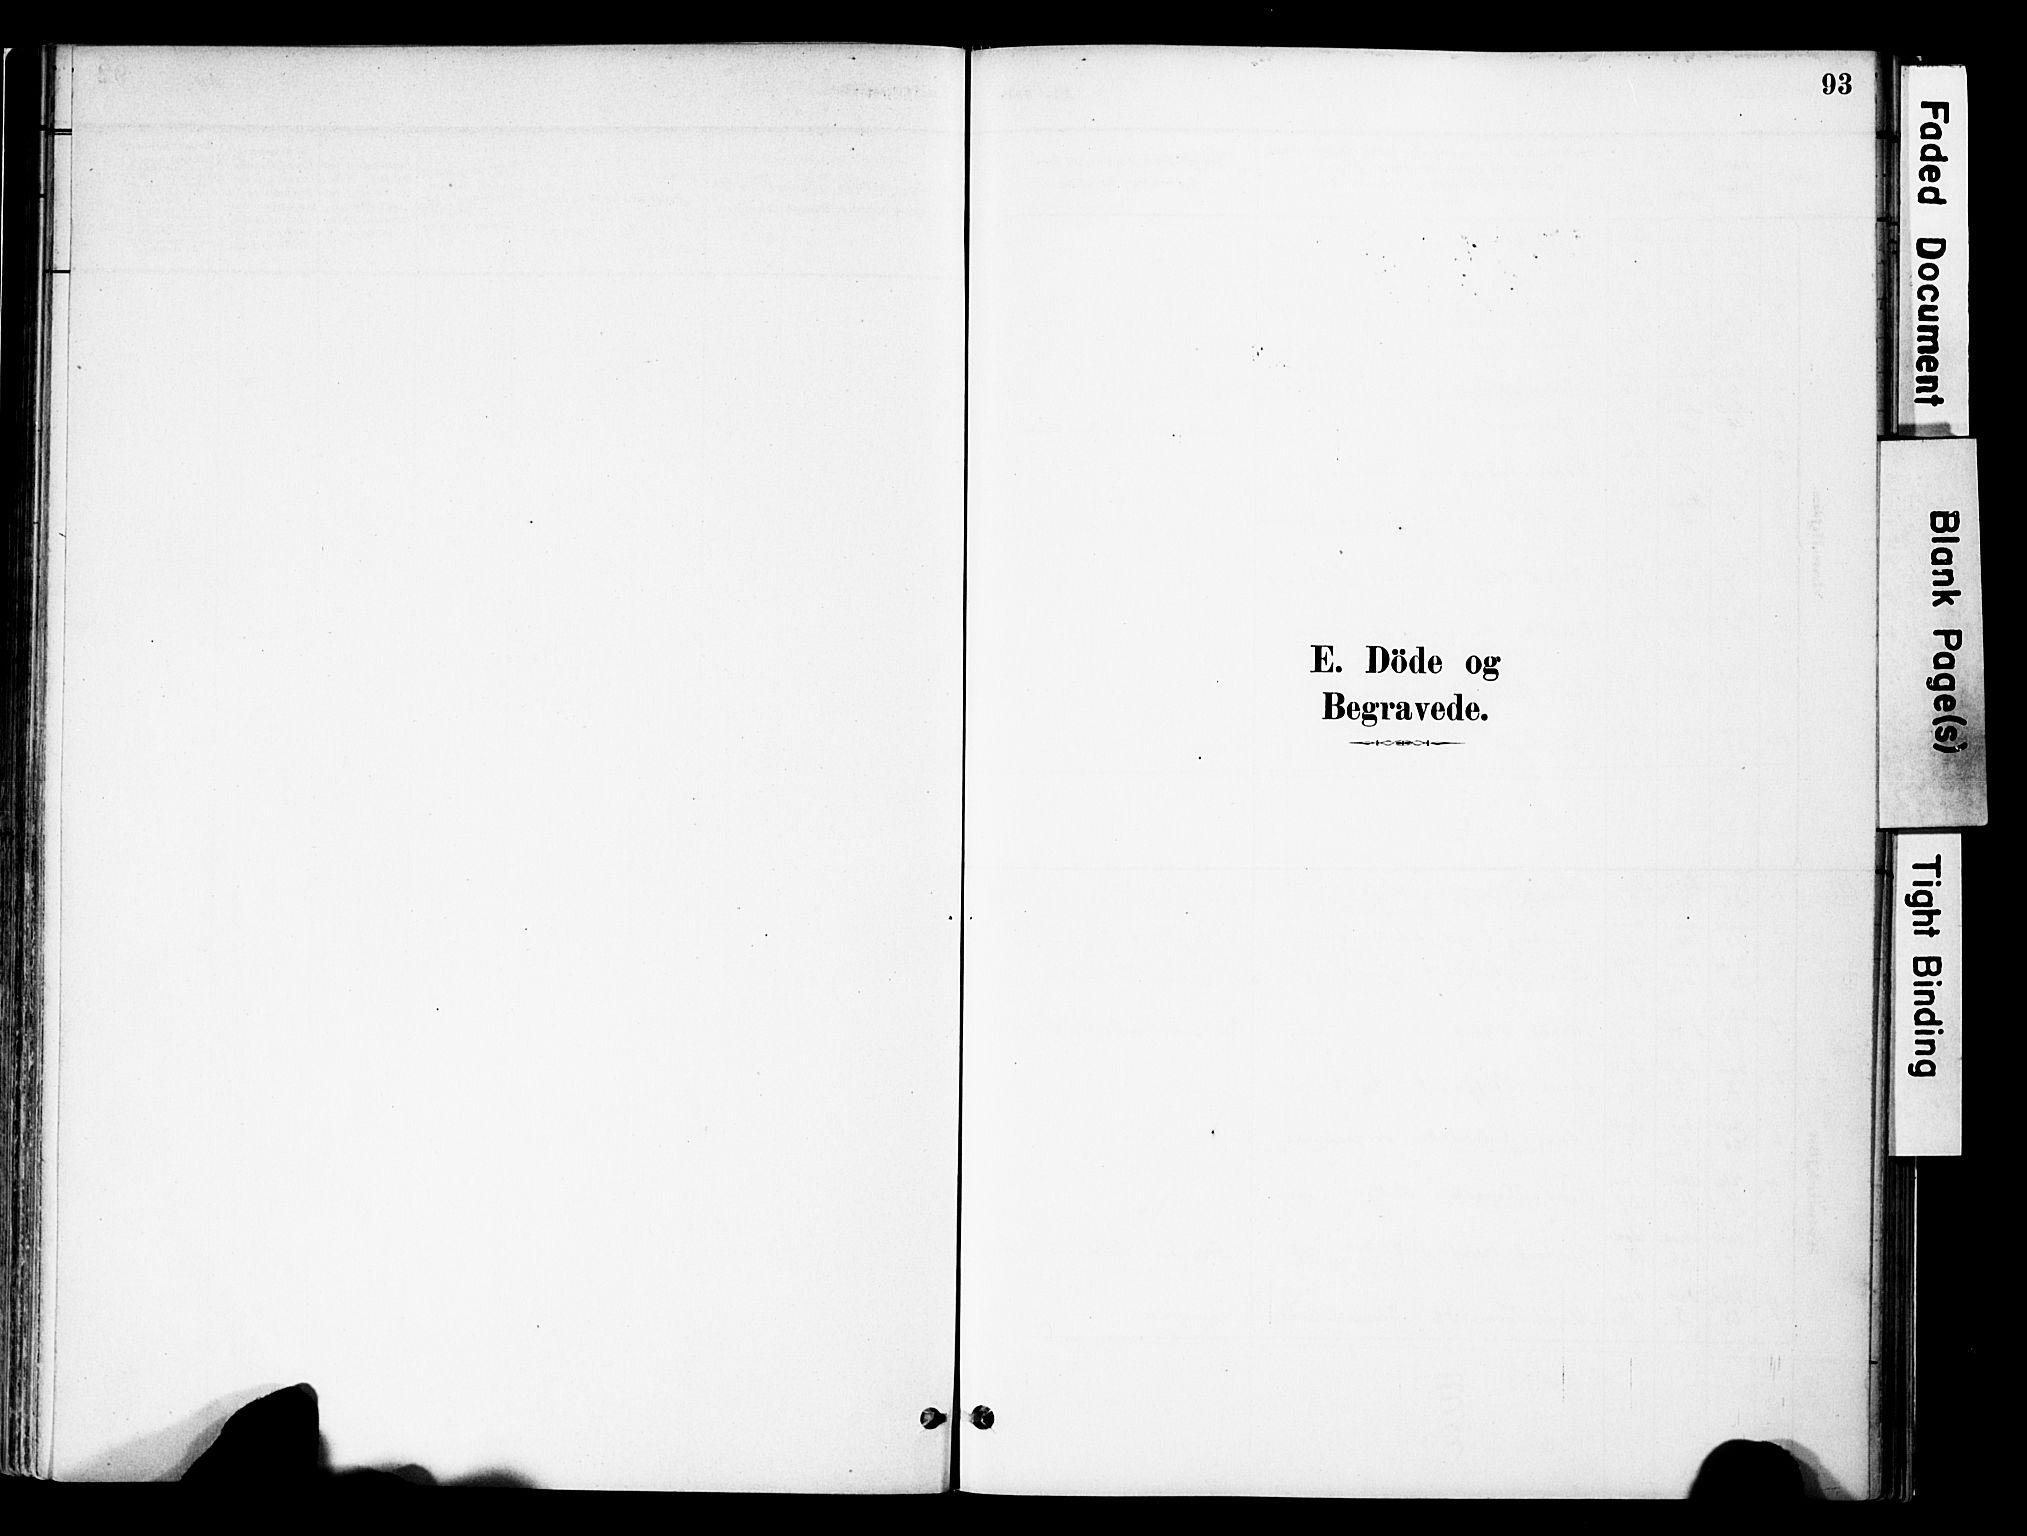 SAH, Vestre Slidre prestekontor, Ministerialbok nr. 5, 1881-1912, s. 93